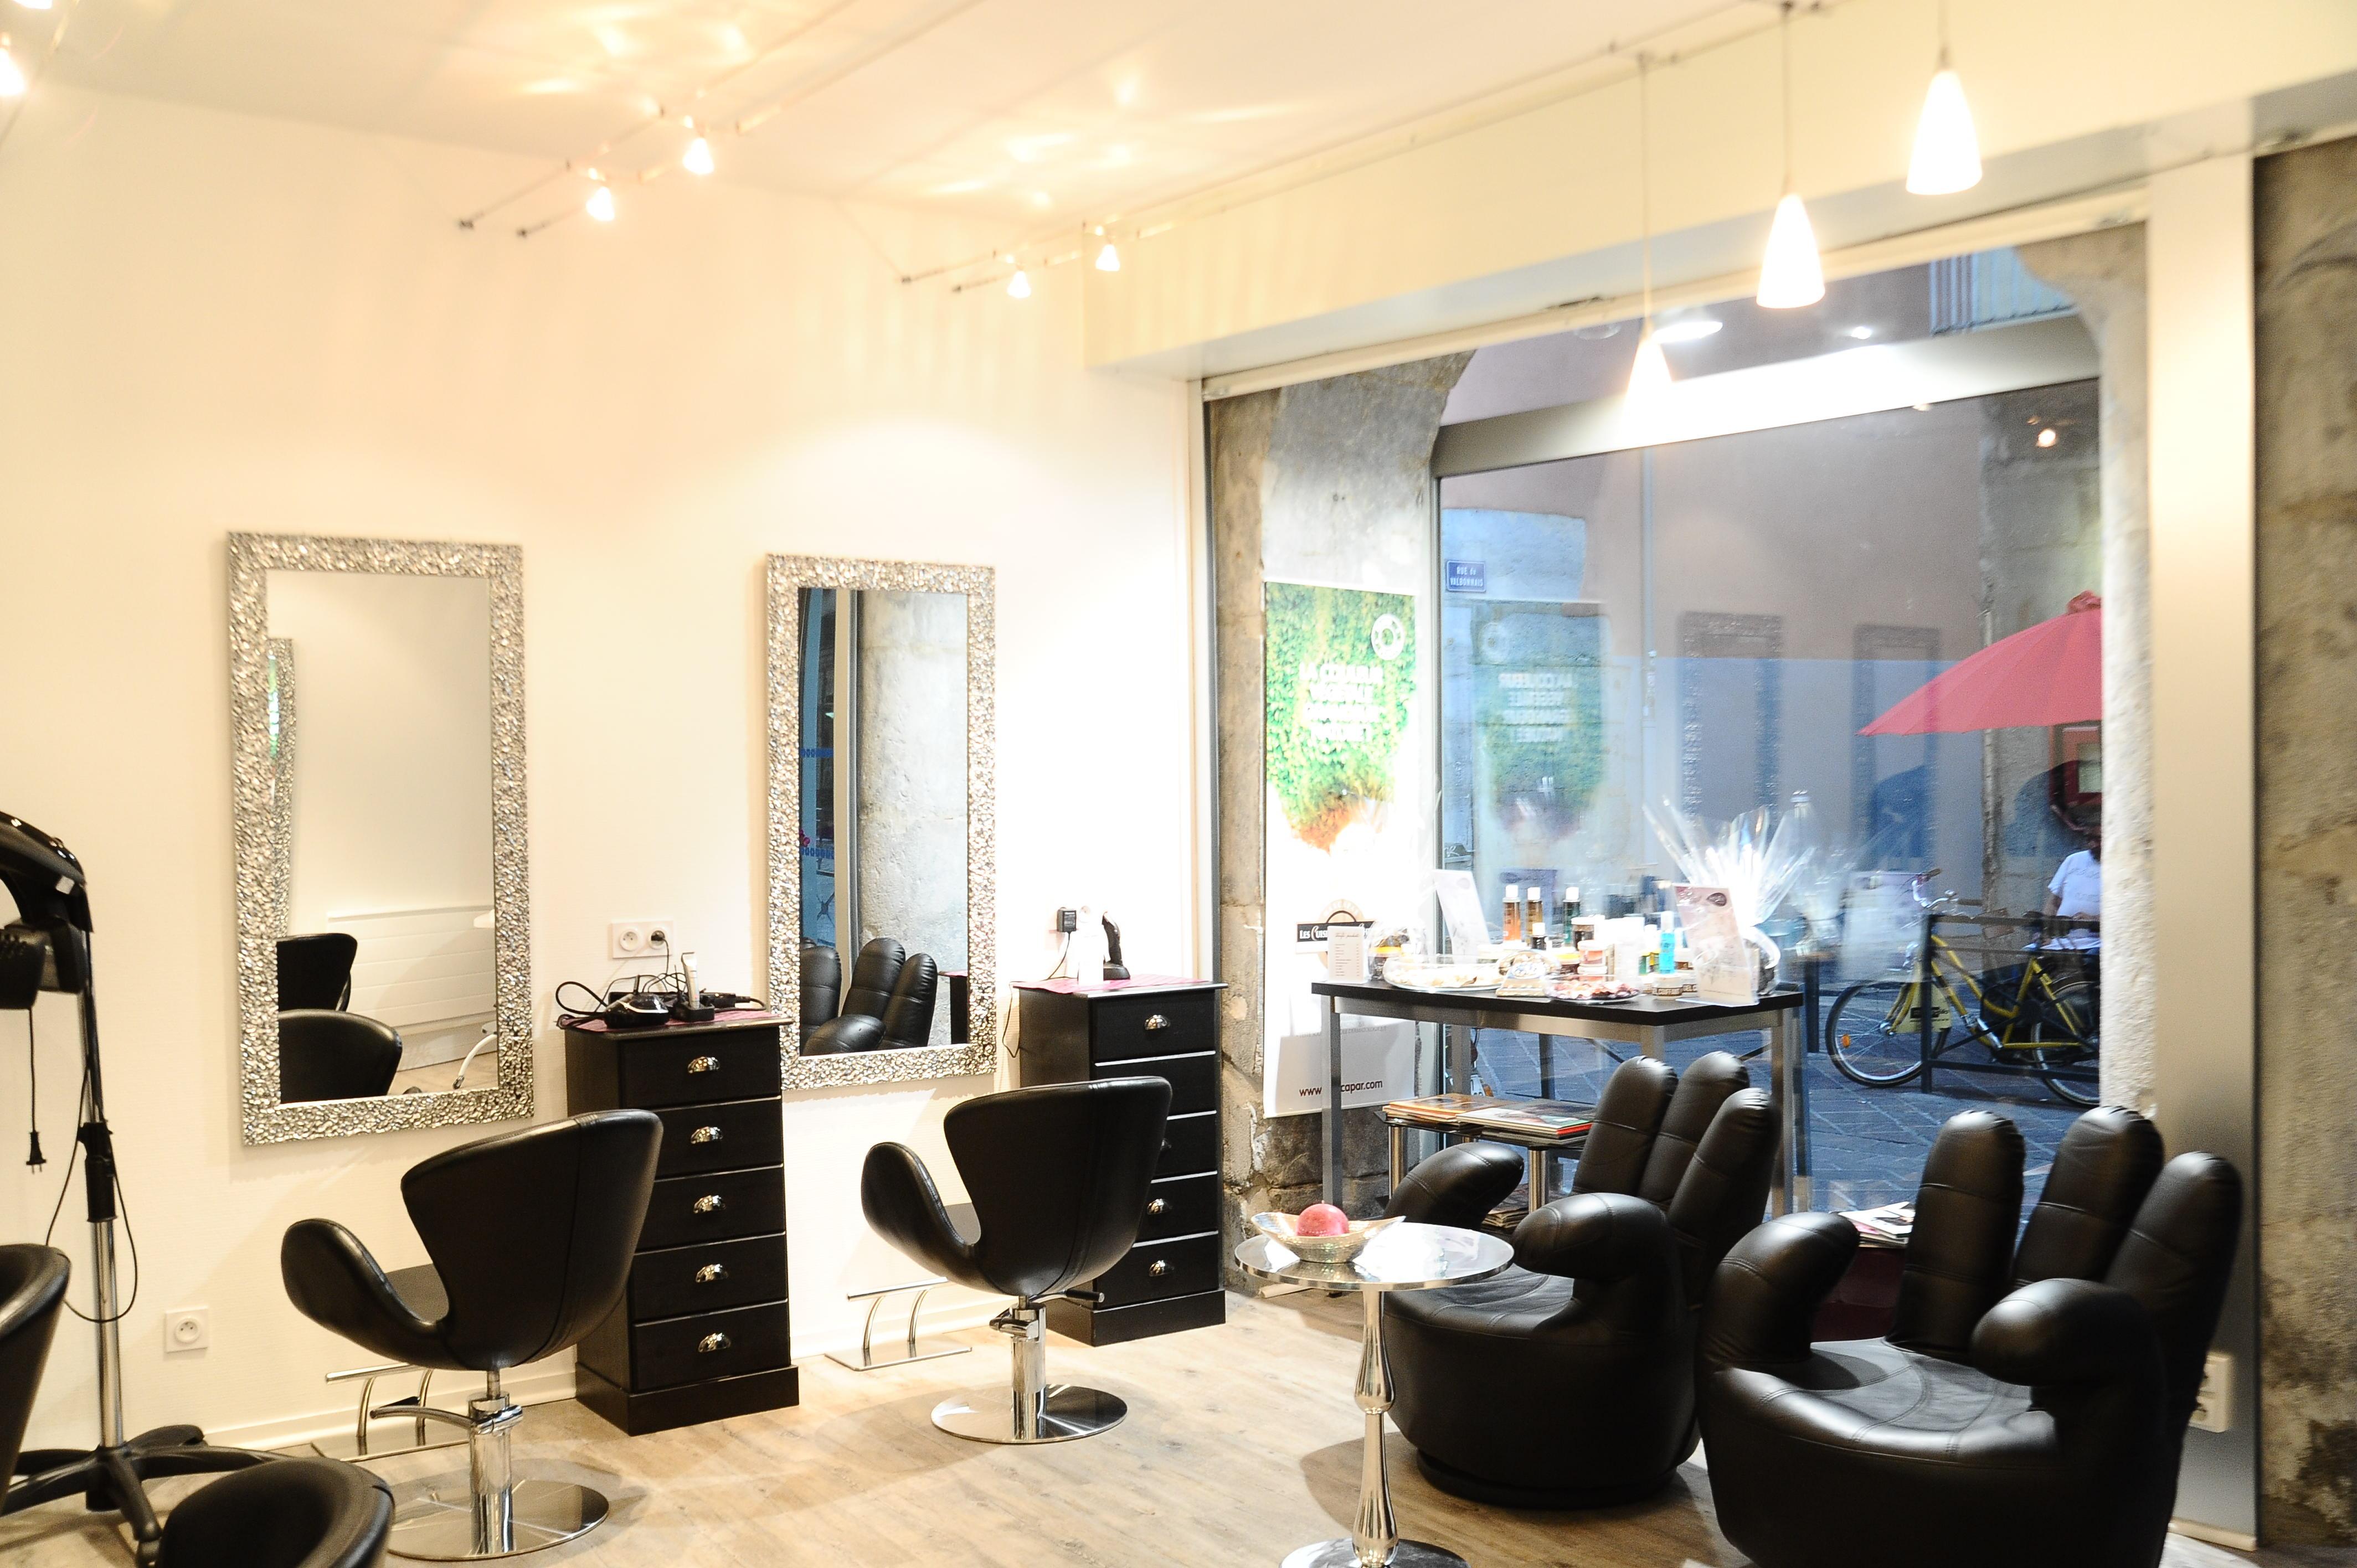 Estethicoiff grenoble avis tarifs horaires t l phone for Salon de coiffure grenoble